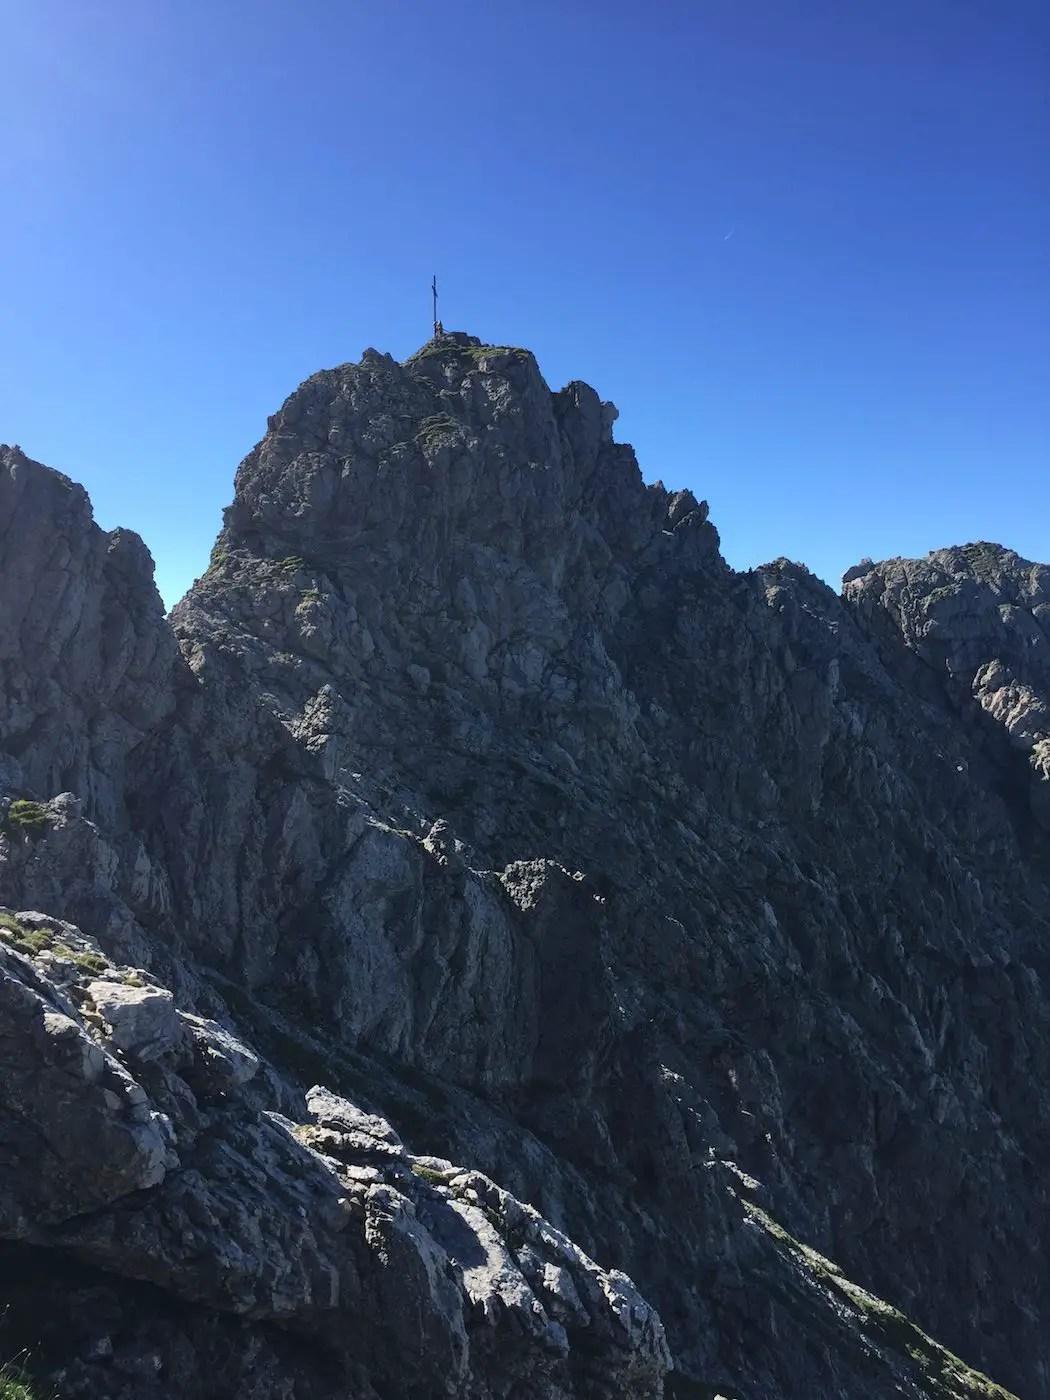 Der Gipfel des Rauhhorn